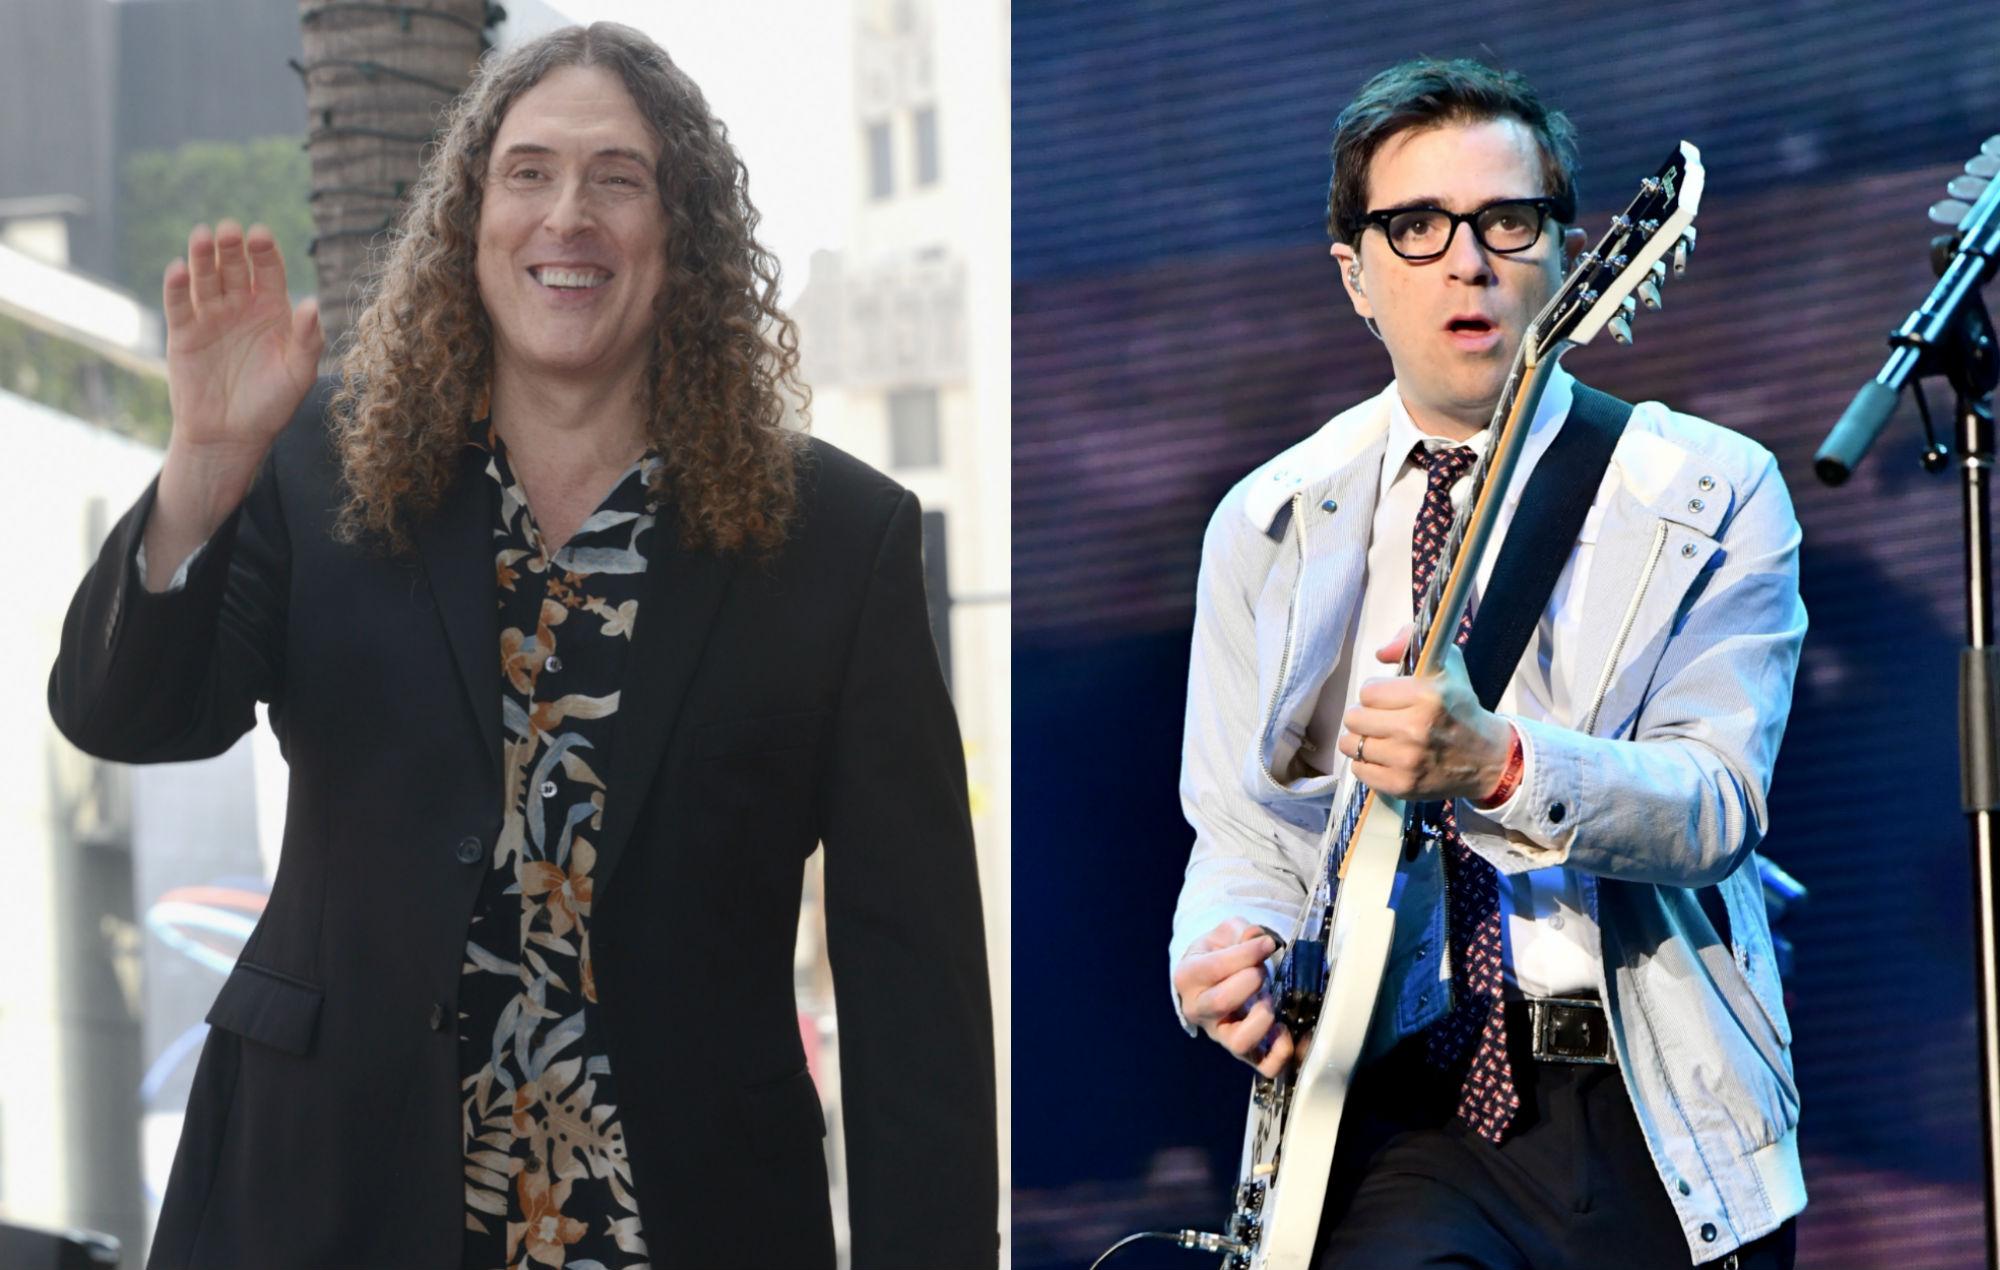 Watch Weird Al Yankovic Fill In For Rivers Cuomo In Weezer